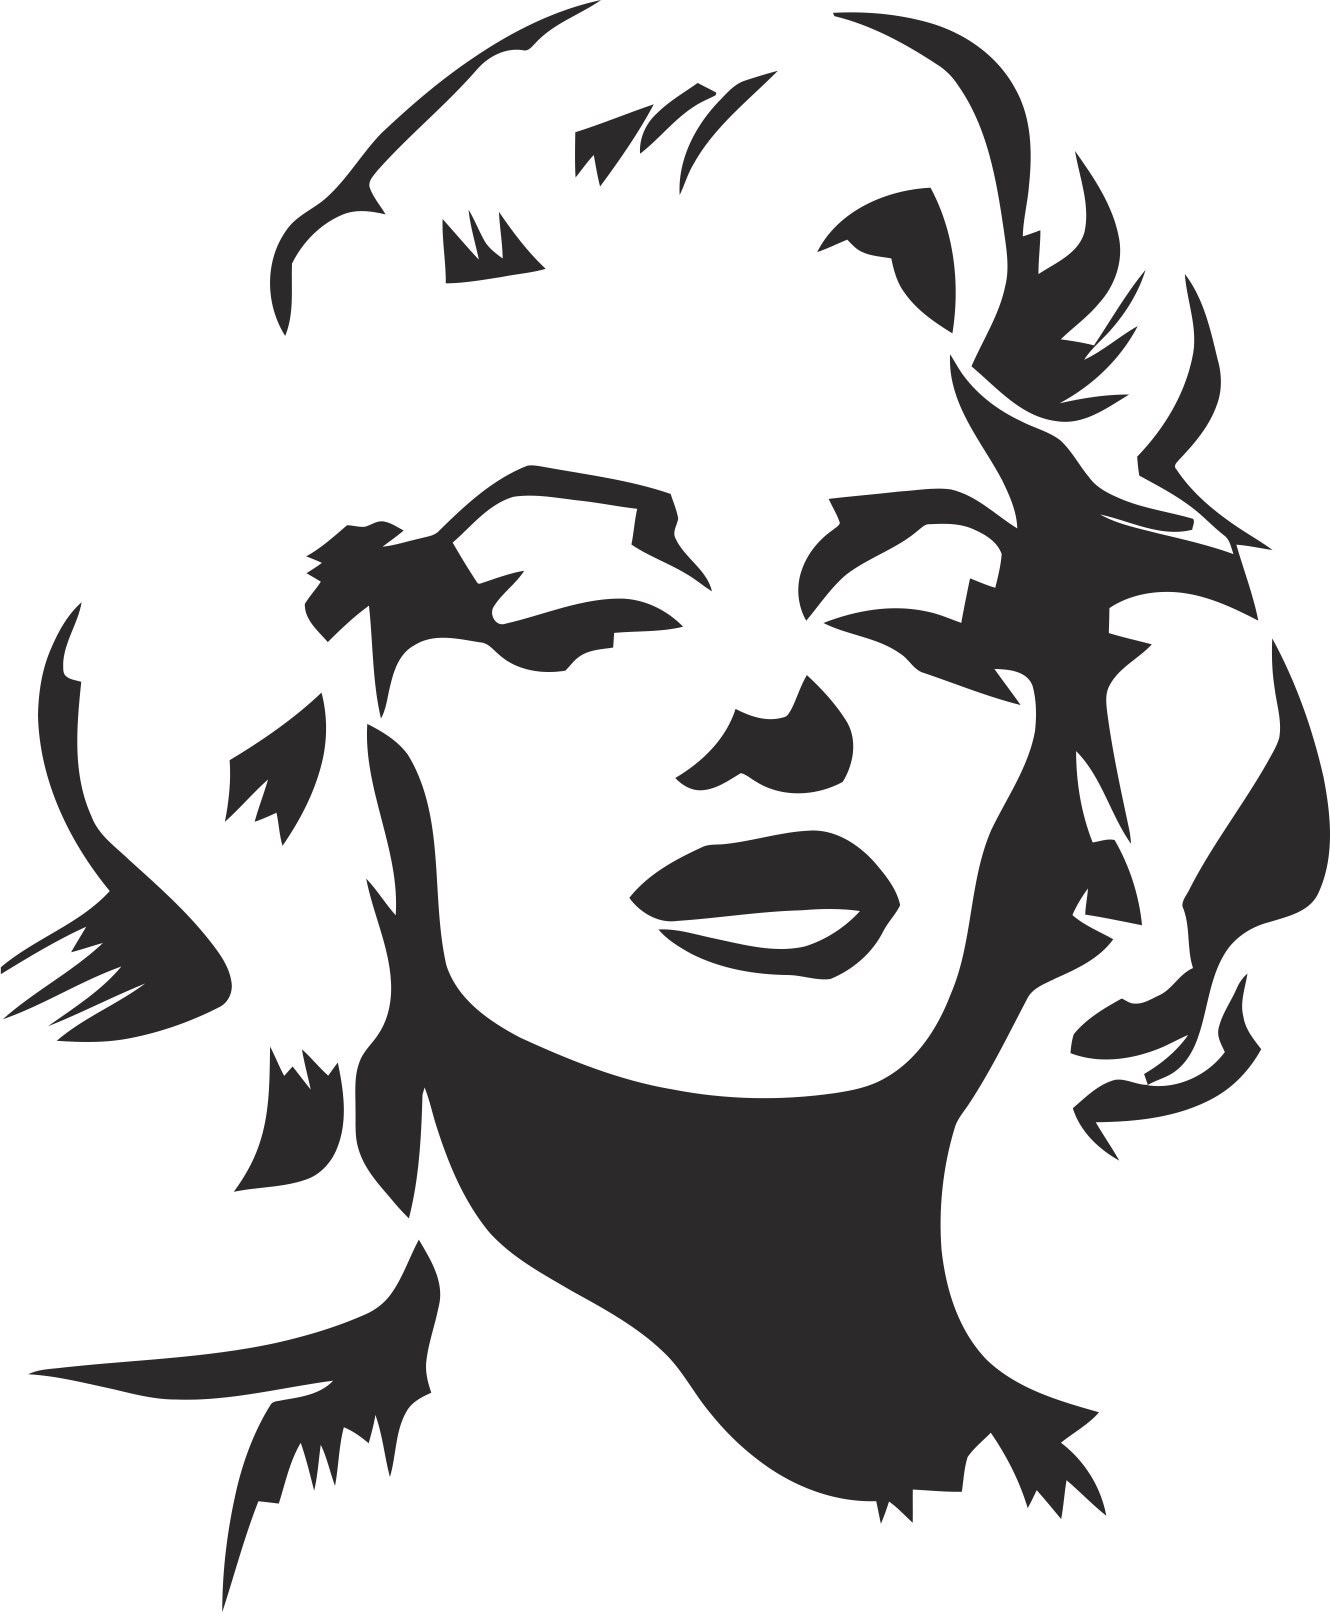 Marilyn Monroe Stencil File Free CDR Vectors Art